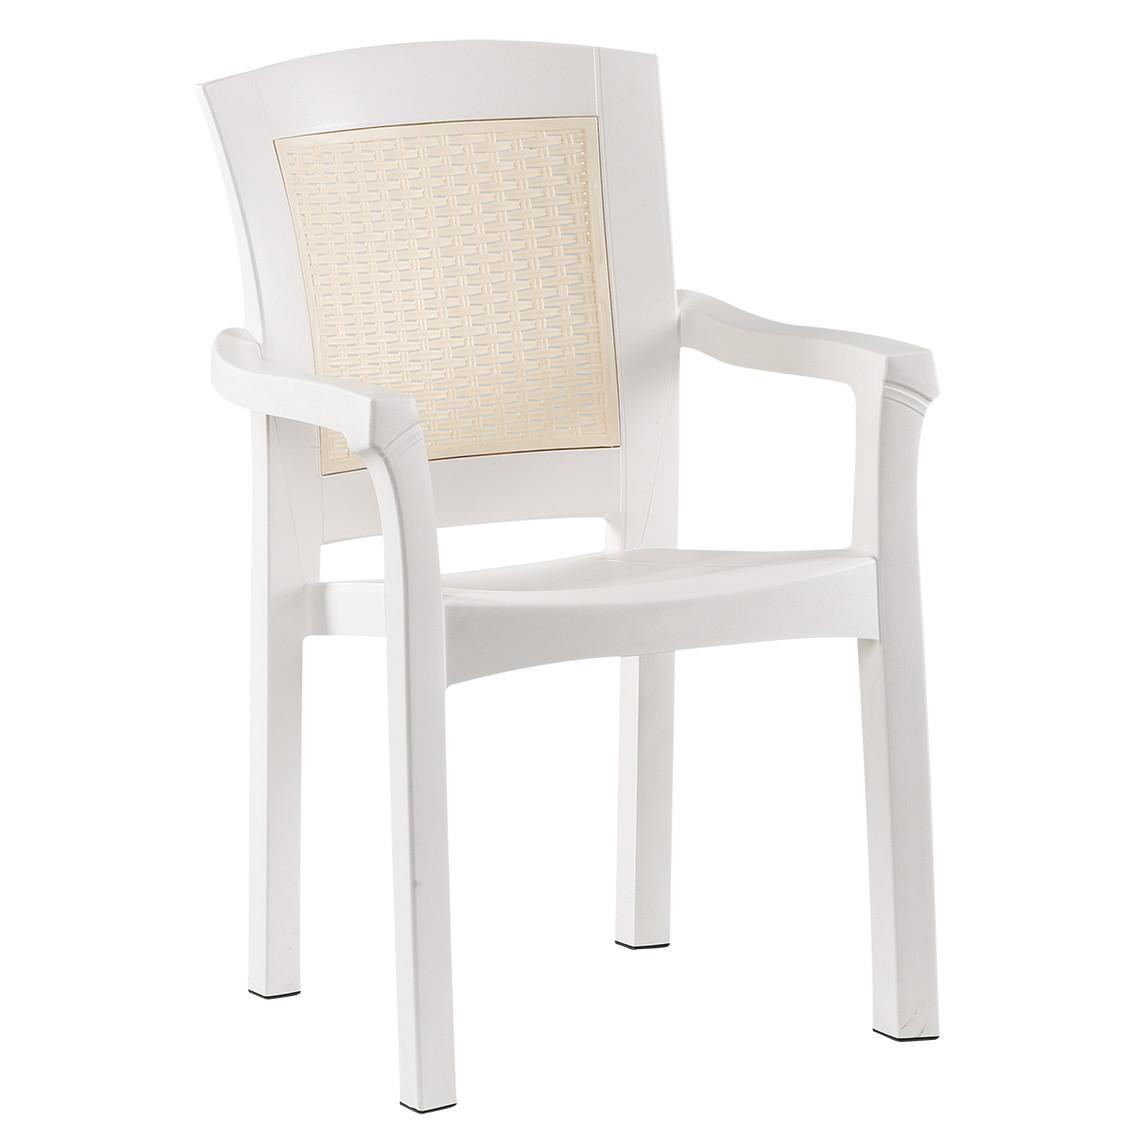 Hk-500 Side Koltuk Beyaz